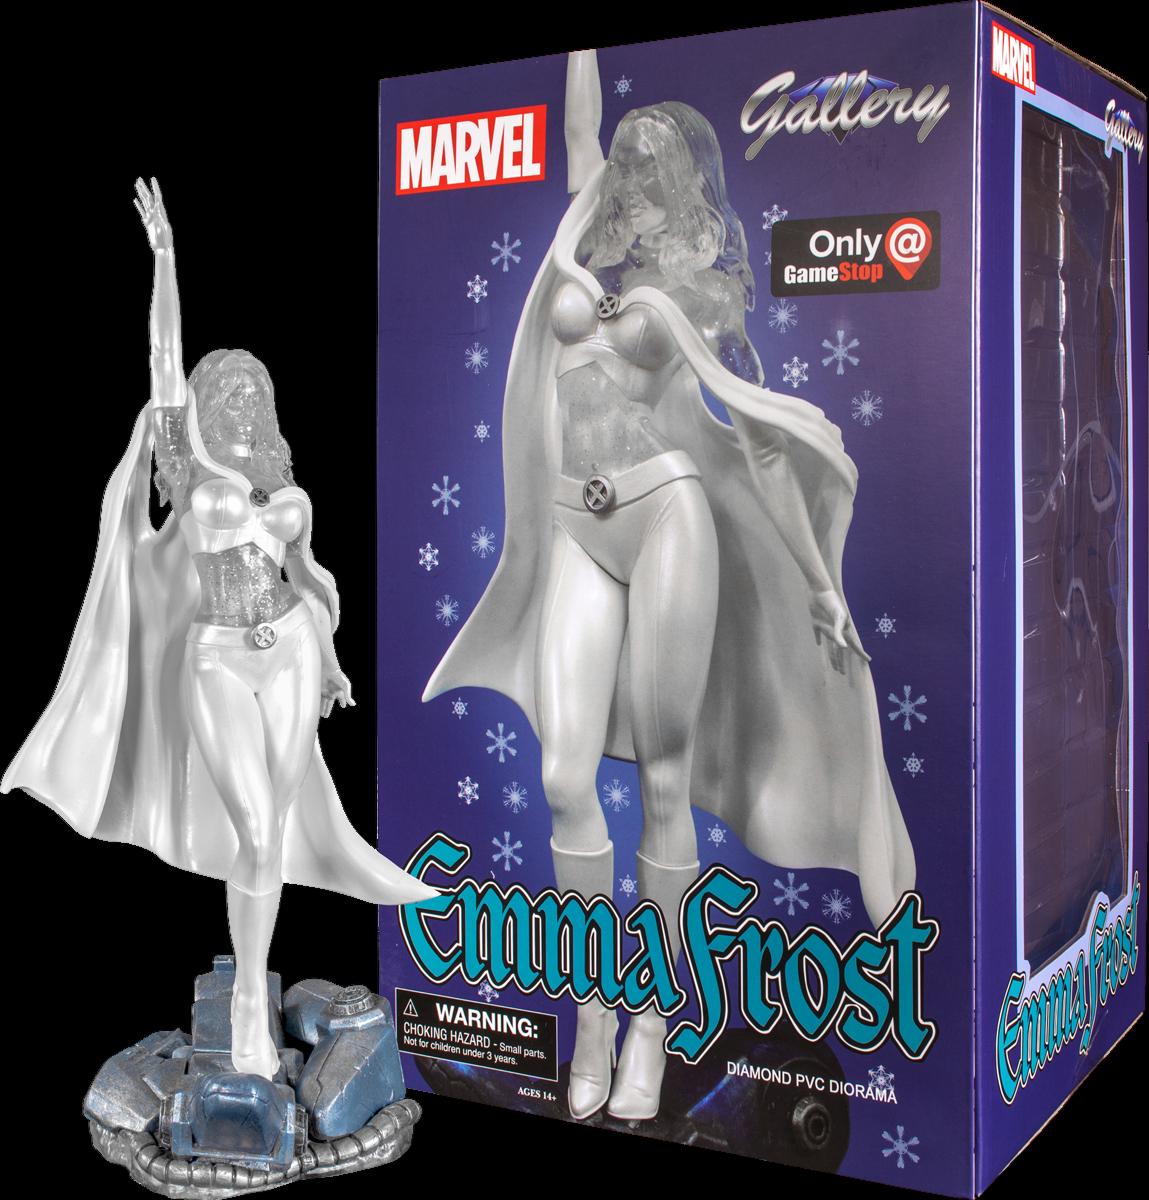 Xessi  Emma Frost bianca regina Gtuttiery StatueDSTMAY189409DIAMOND SELECT giocattoli